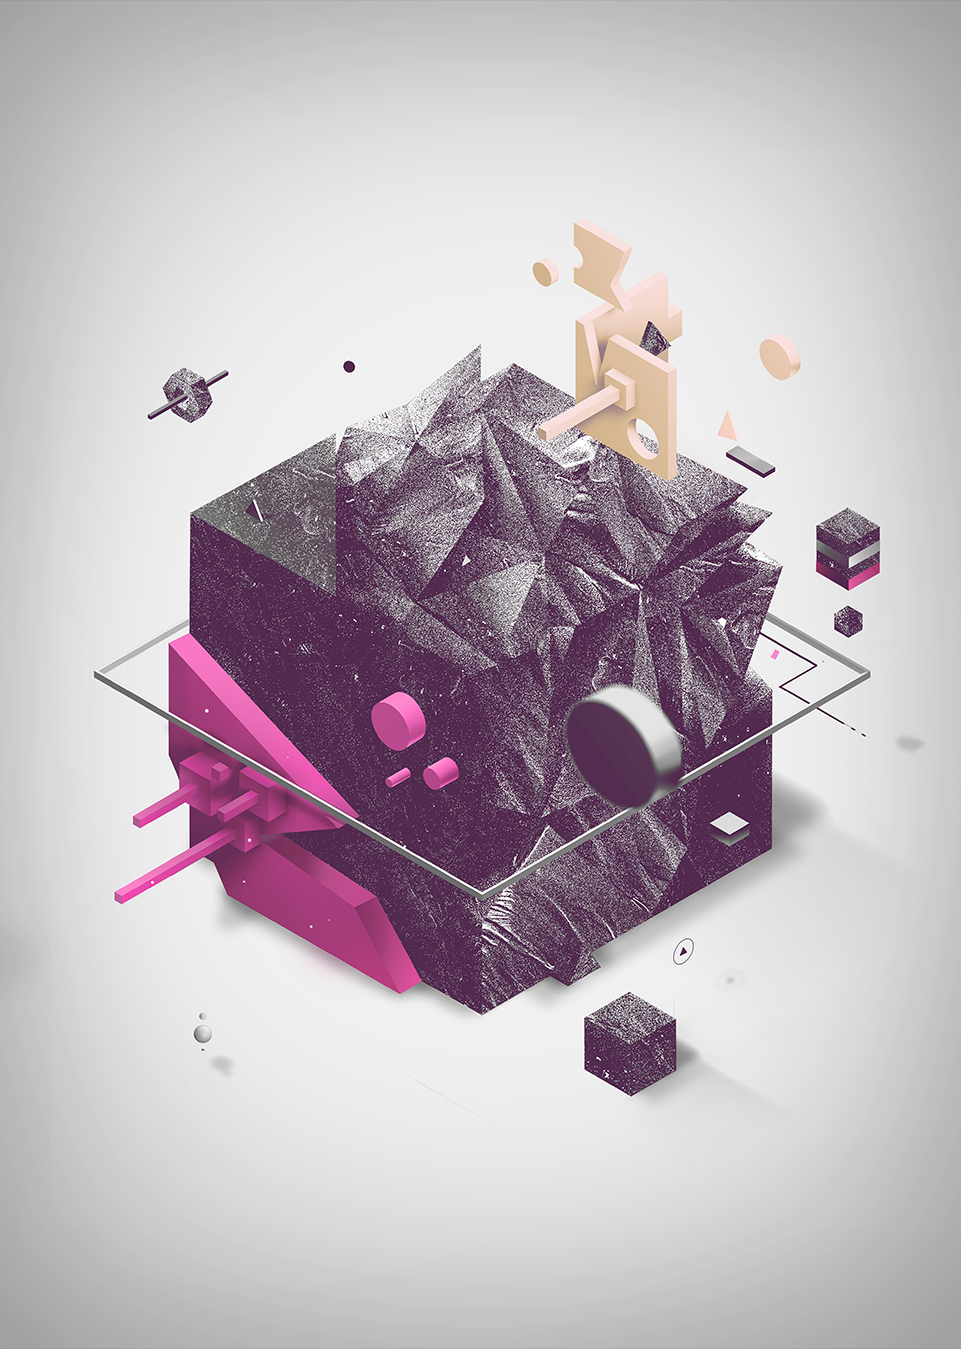 20 Amazing Graphic Design Works by Rogier de Boeve ...